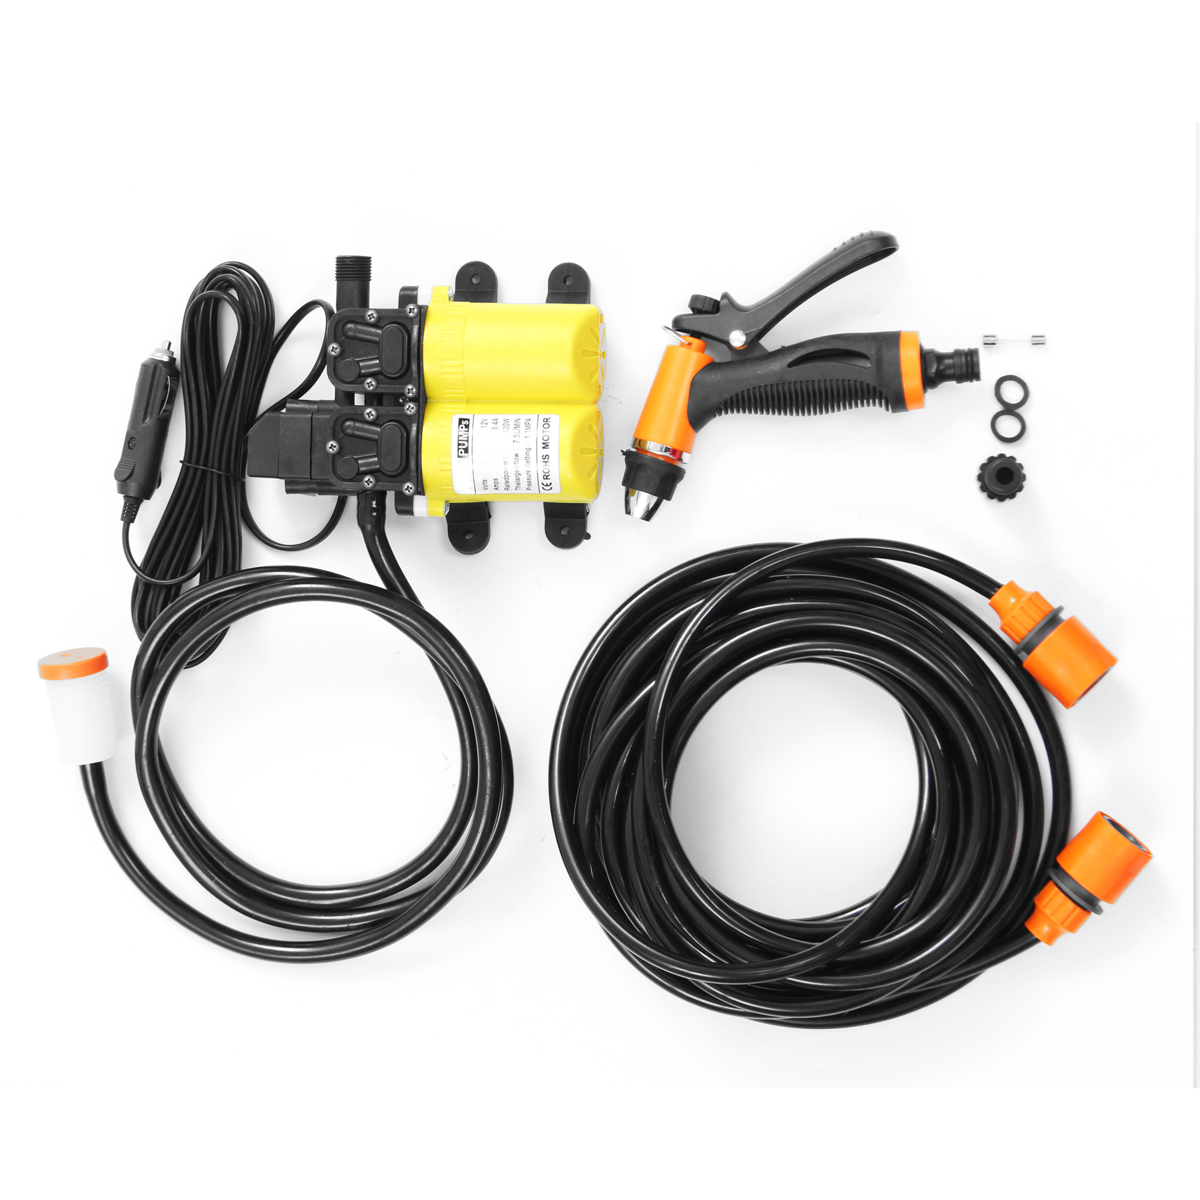 12V 100W Mini Portable Electric Washer Pump Car Washer Pump Washing Tools Set